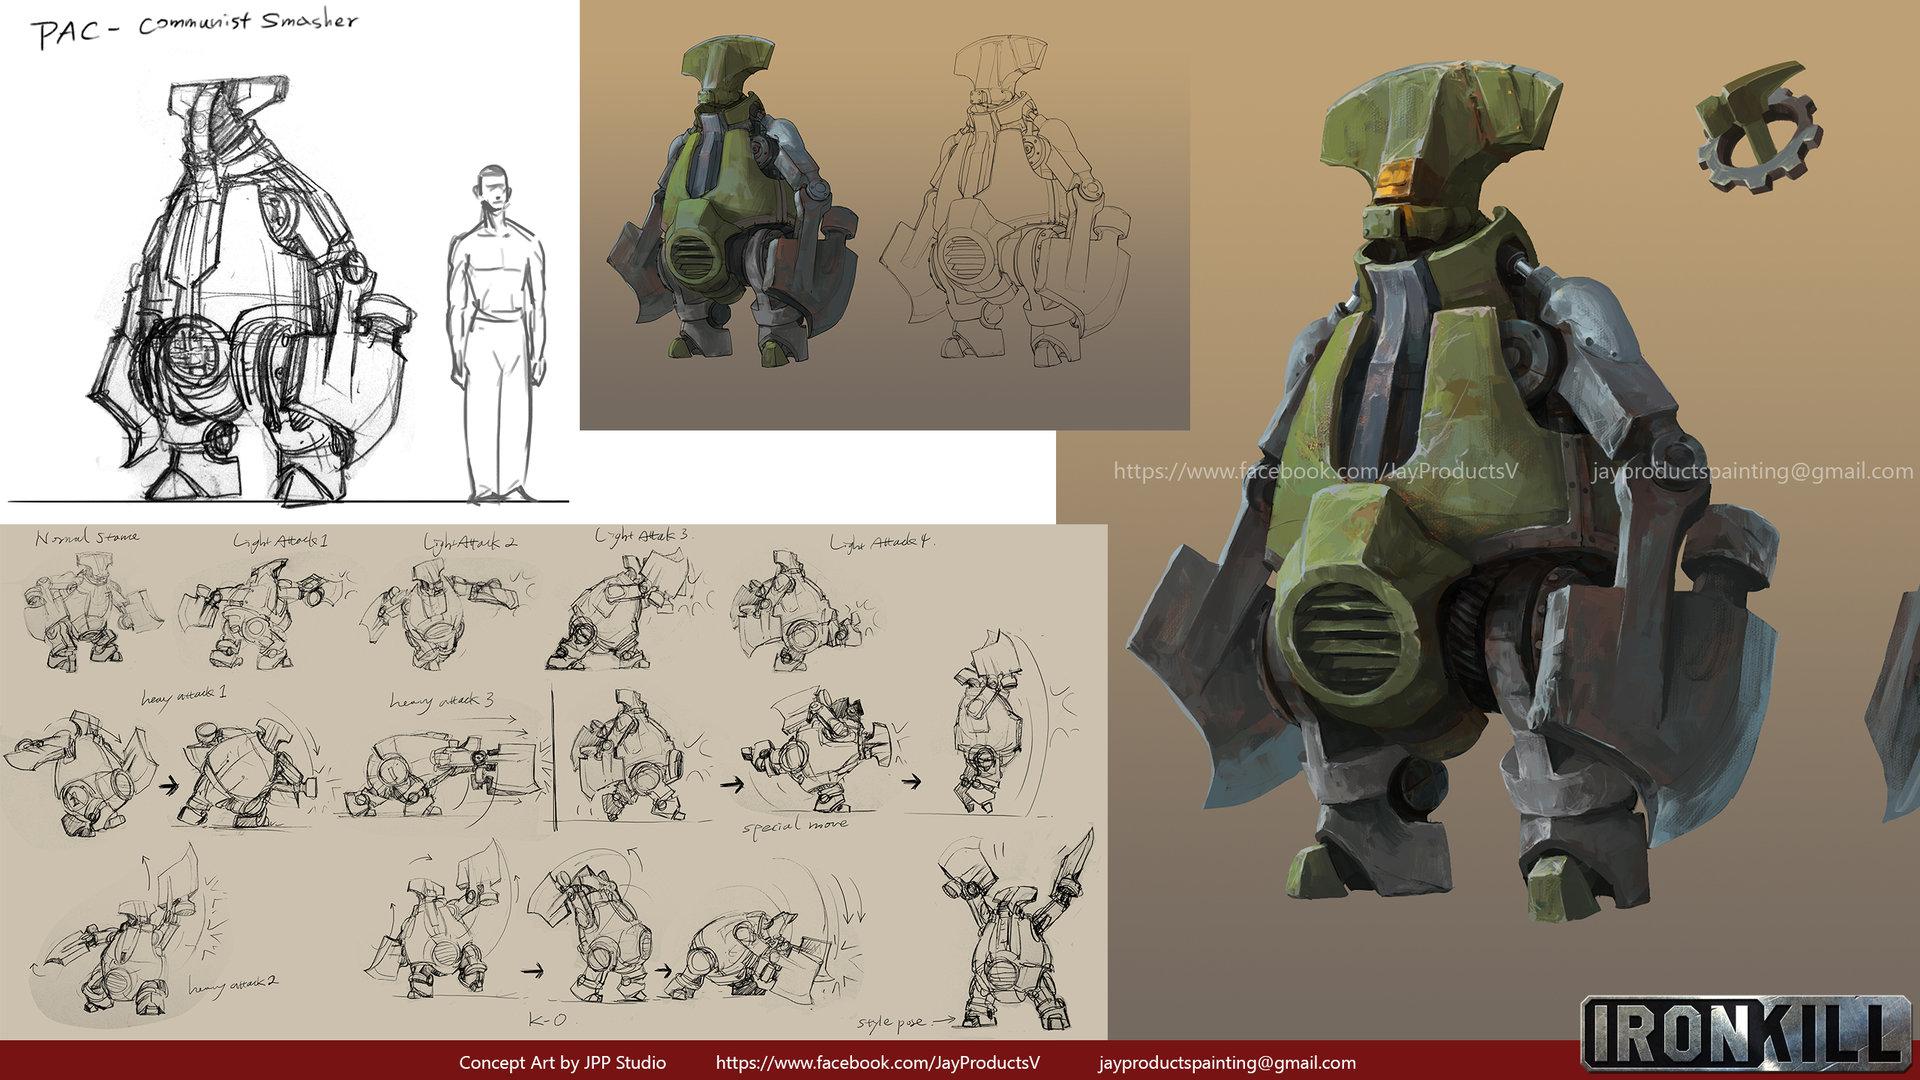 Game Character Design Apps : Artstation ironkill app game artwork the robot smasher concept